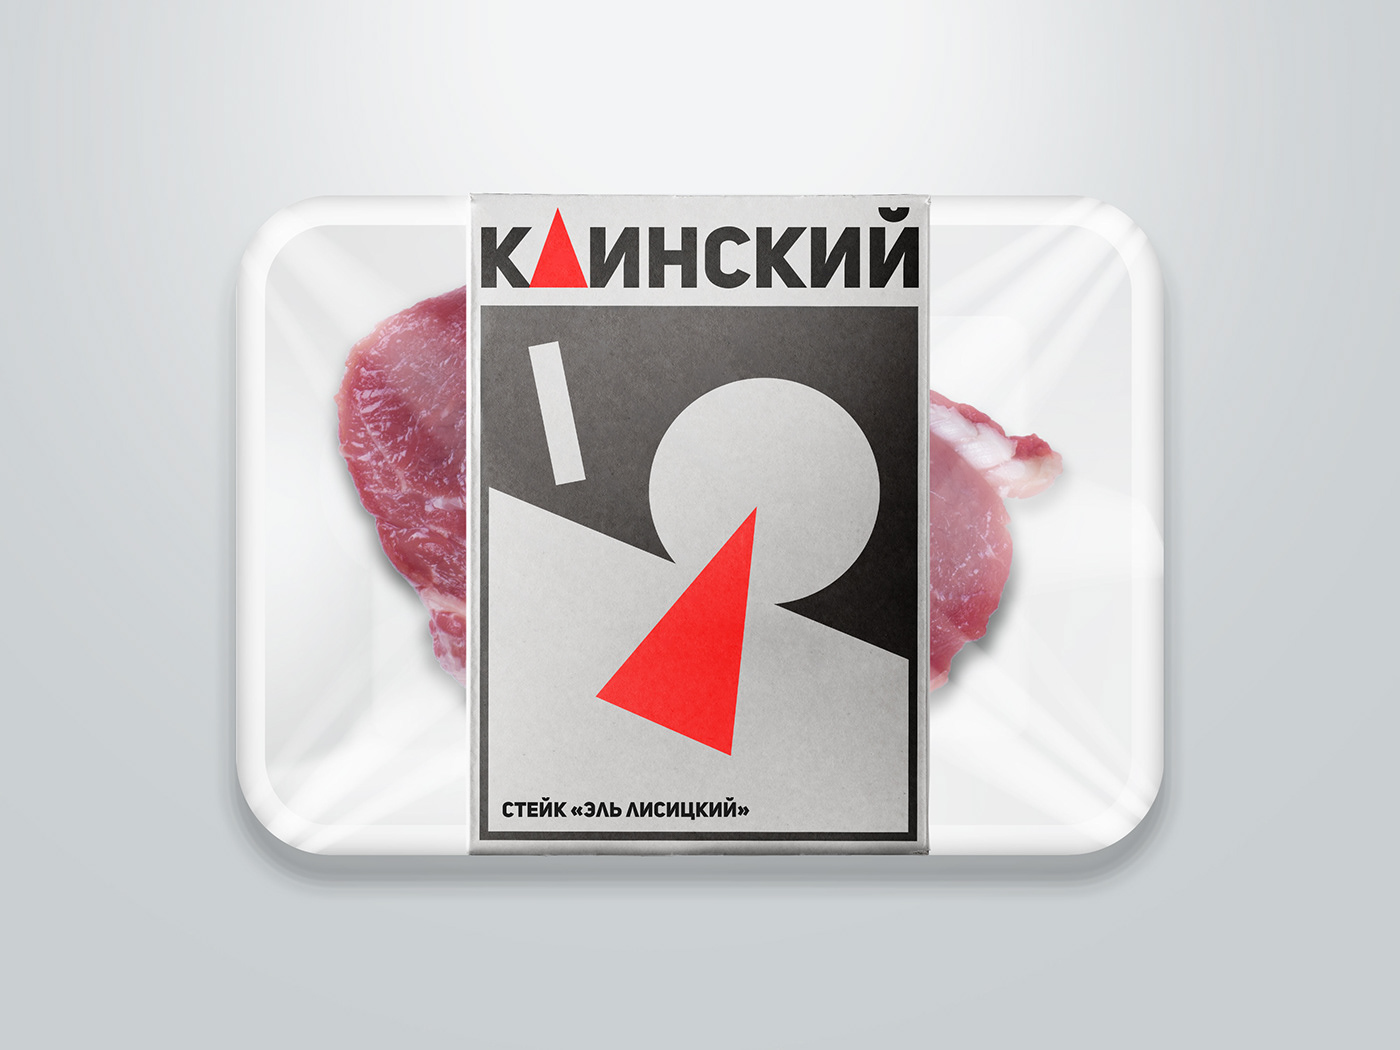 art,design,malevich,meat,Packaging,pork,product,sausage,Soviet,supremacism